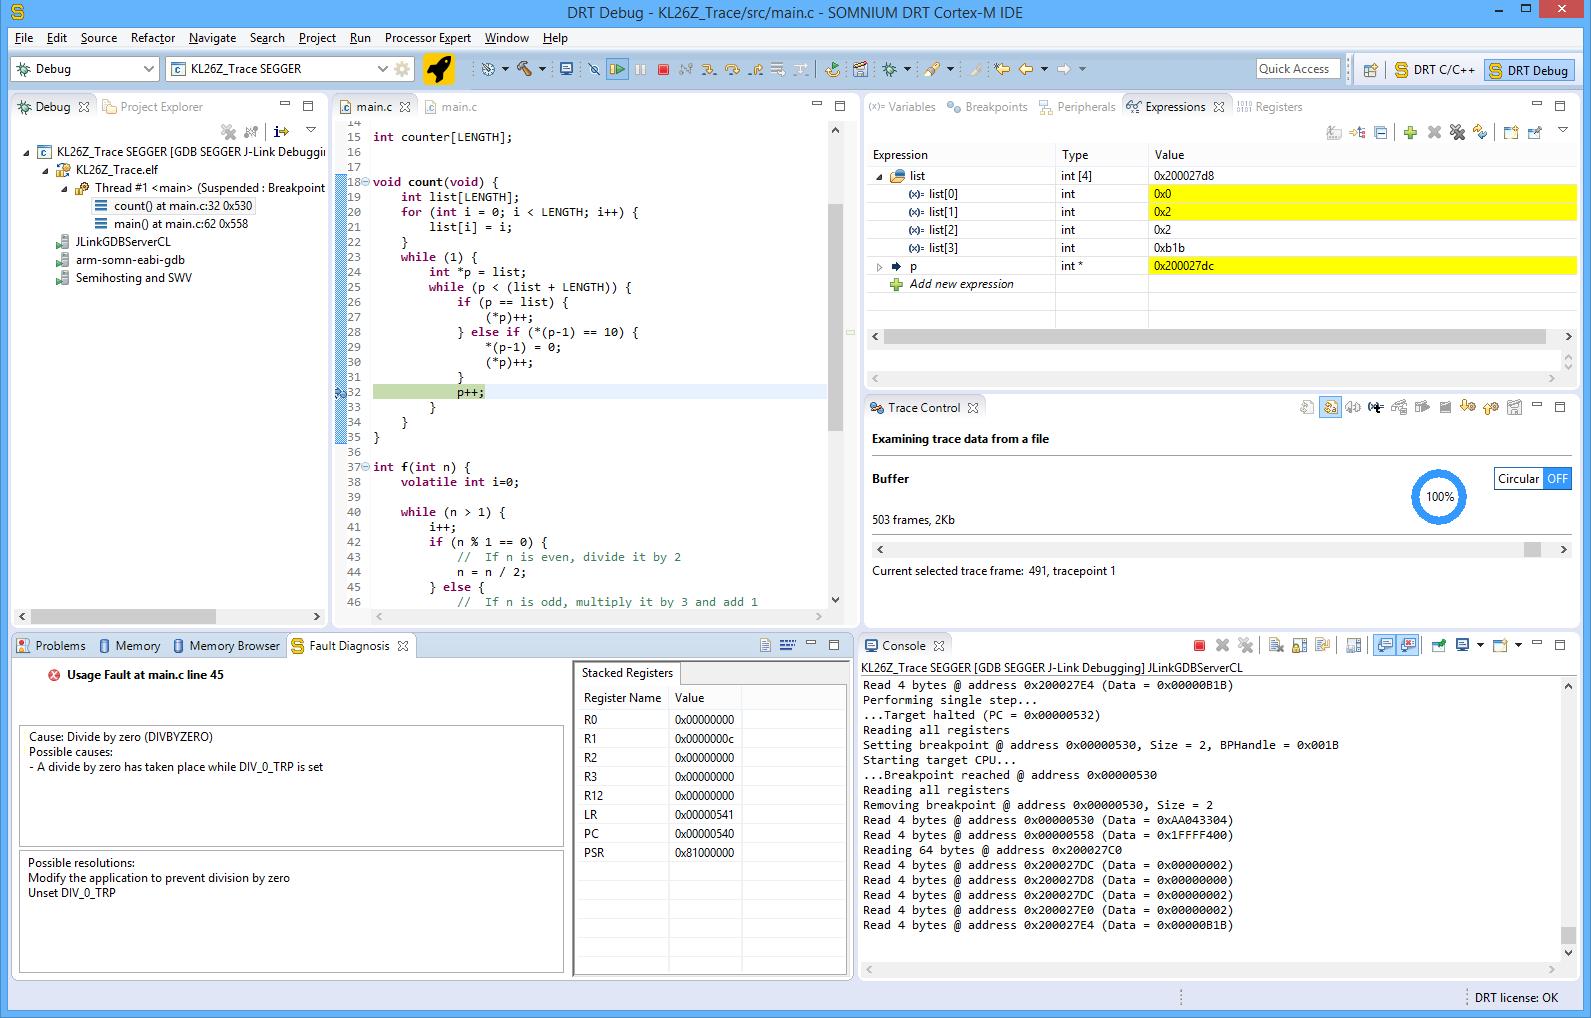 SOMNIUM DRT Cortex-M IDE | Eclipse Plugins, Bundles and Products